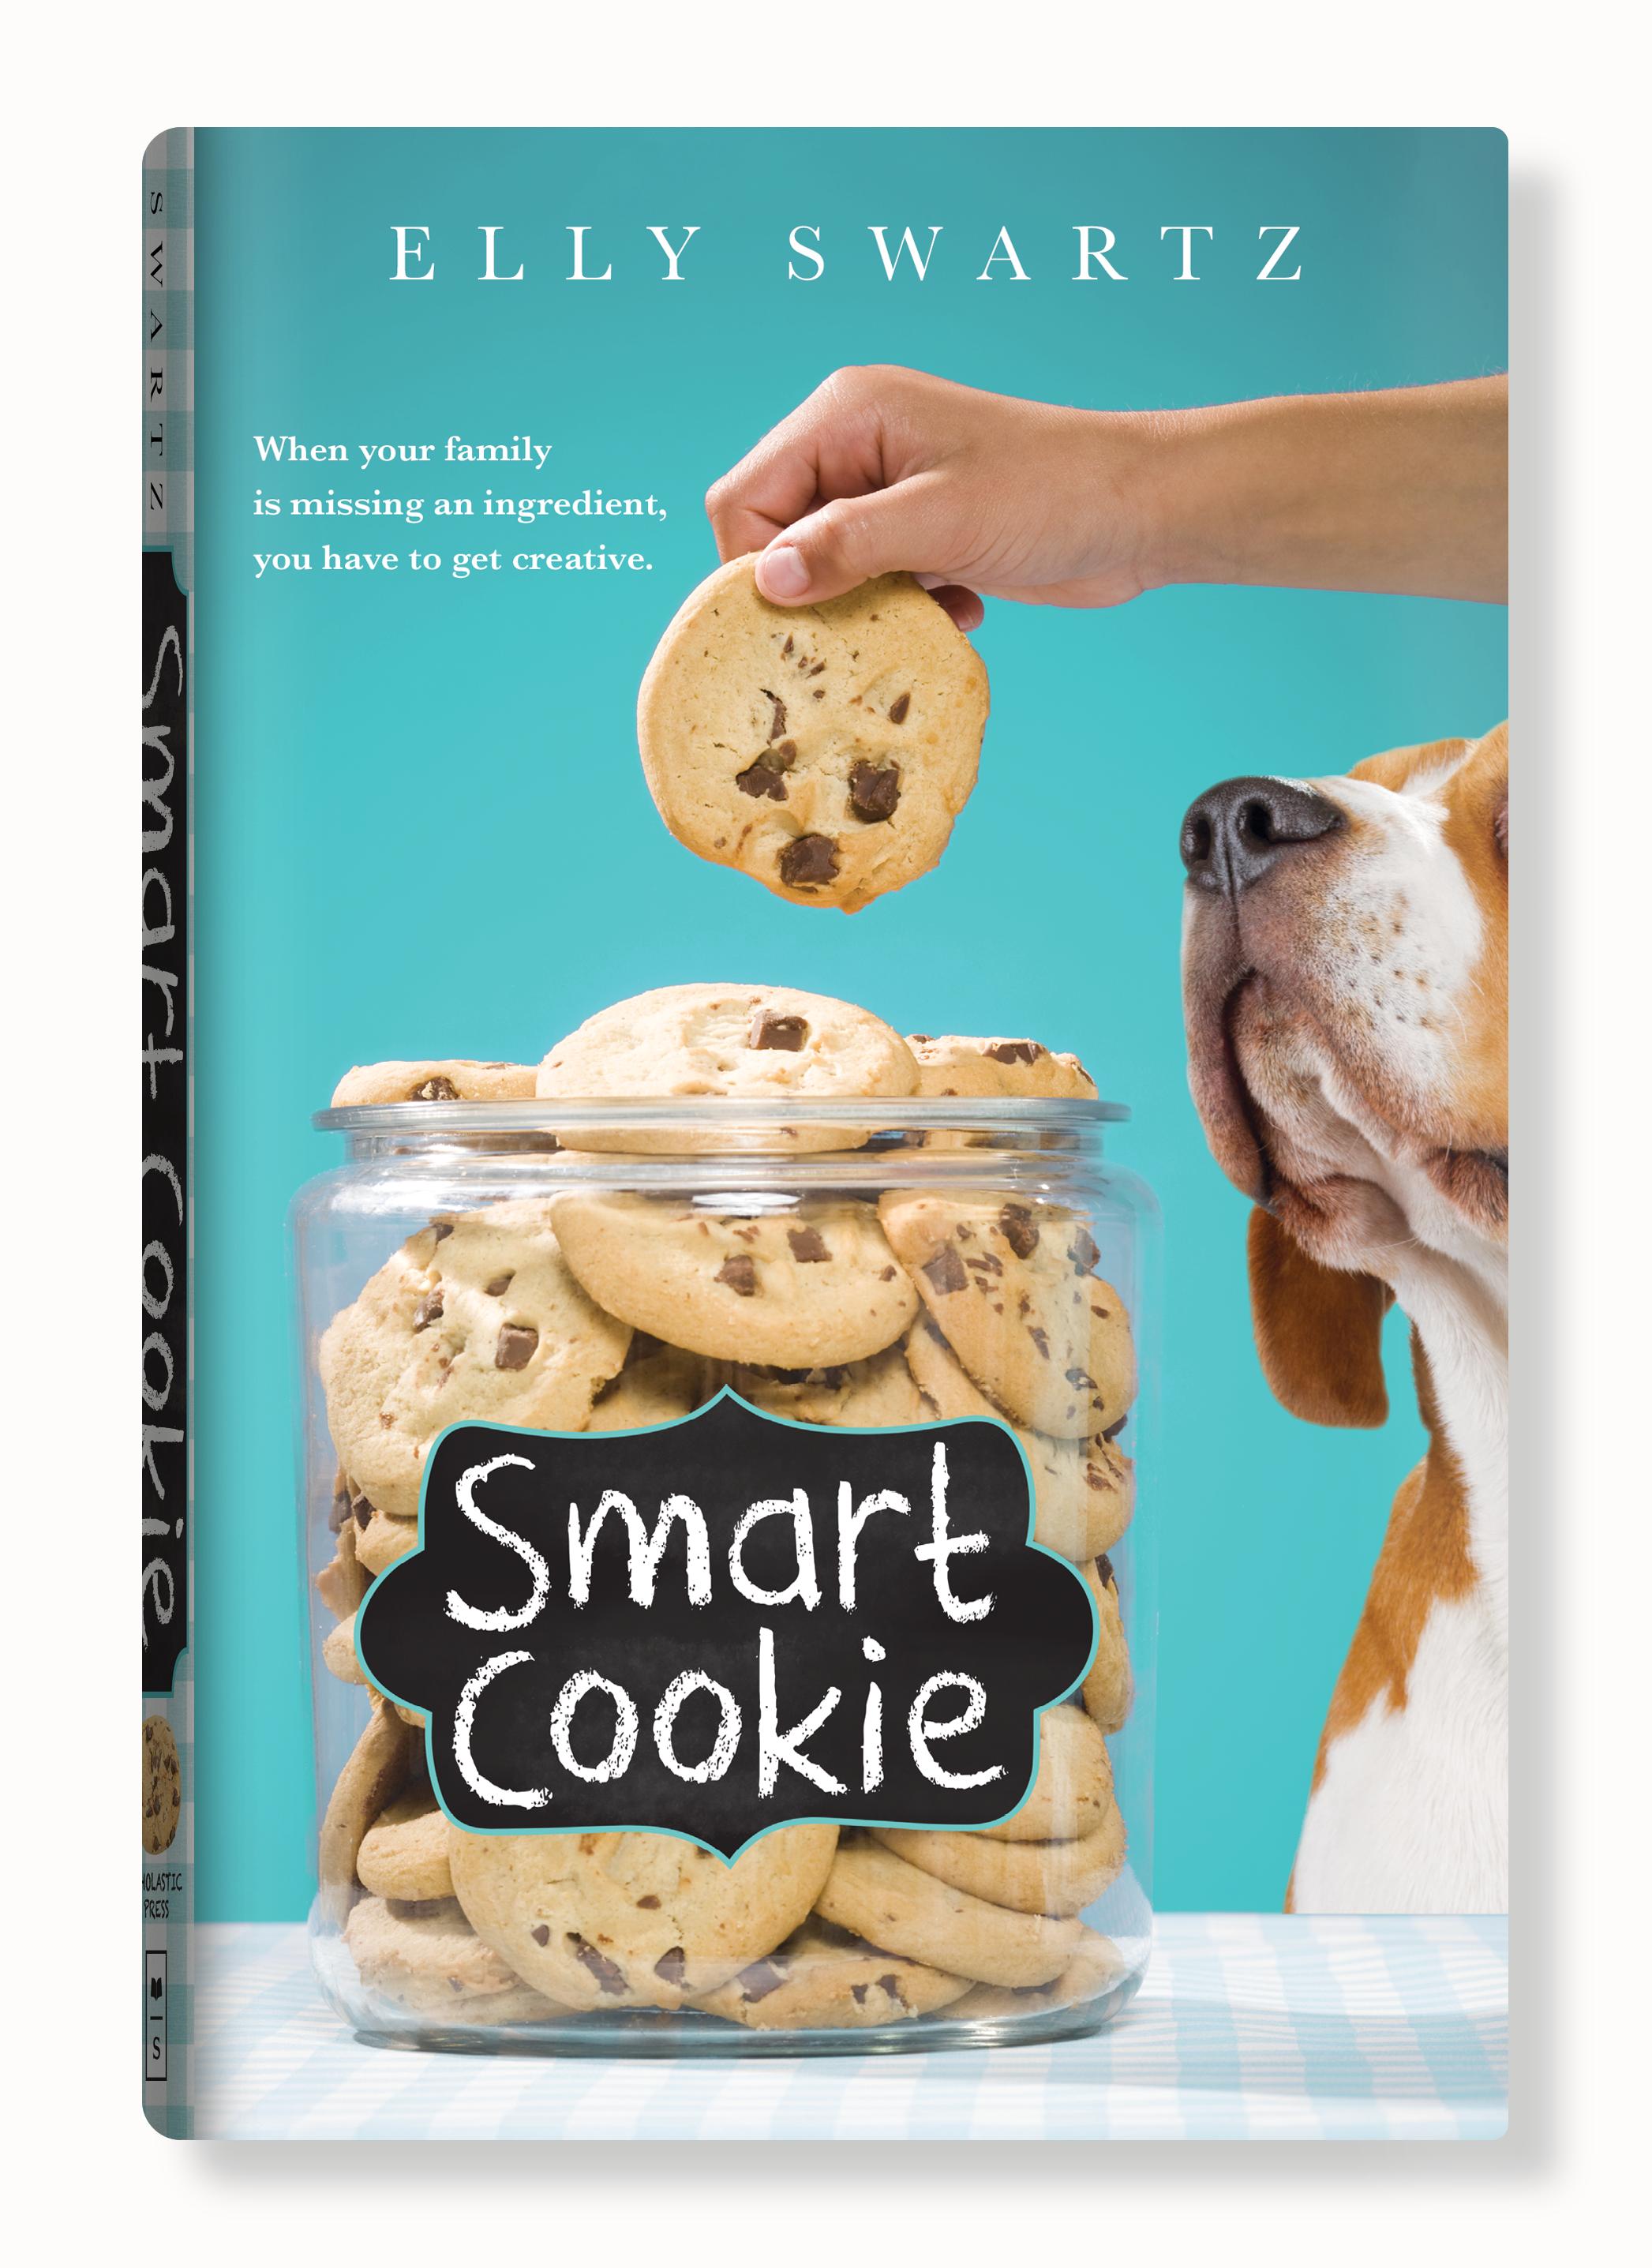 Jacket photos ©: cookie jar: Rubberball/Mike Kemp/Getty Images; dog: Silense/iStockphoto; bell: appler/Shutterstock; hedgehog: Best dog photo/Shutterstock; crumbled cookie: Dani Vincek/Shutterstock; cookie: Sergio33/Shutterstock;gingham: kwasny221/iStockphoto.